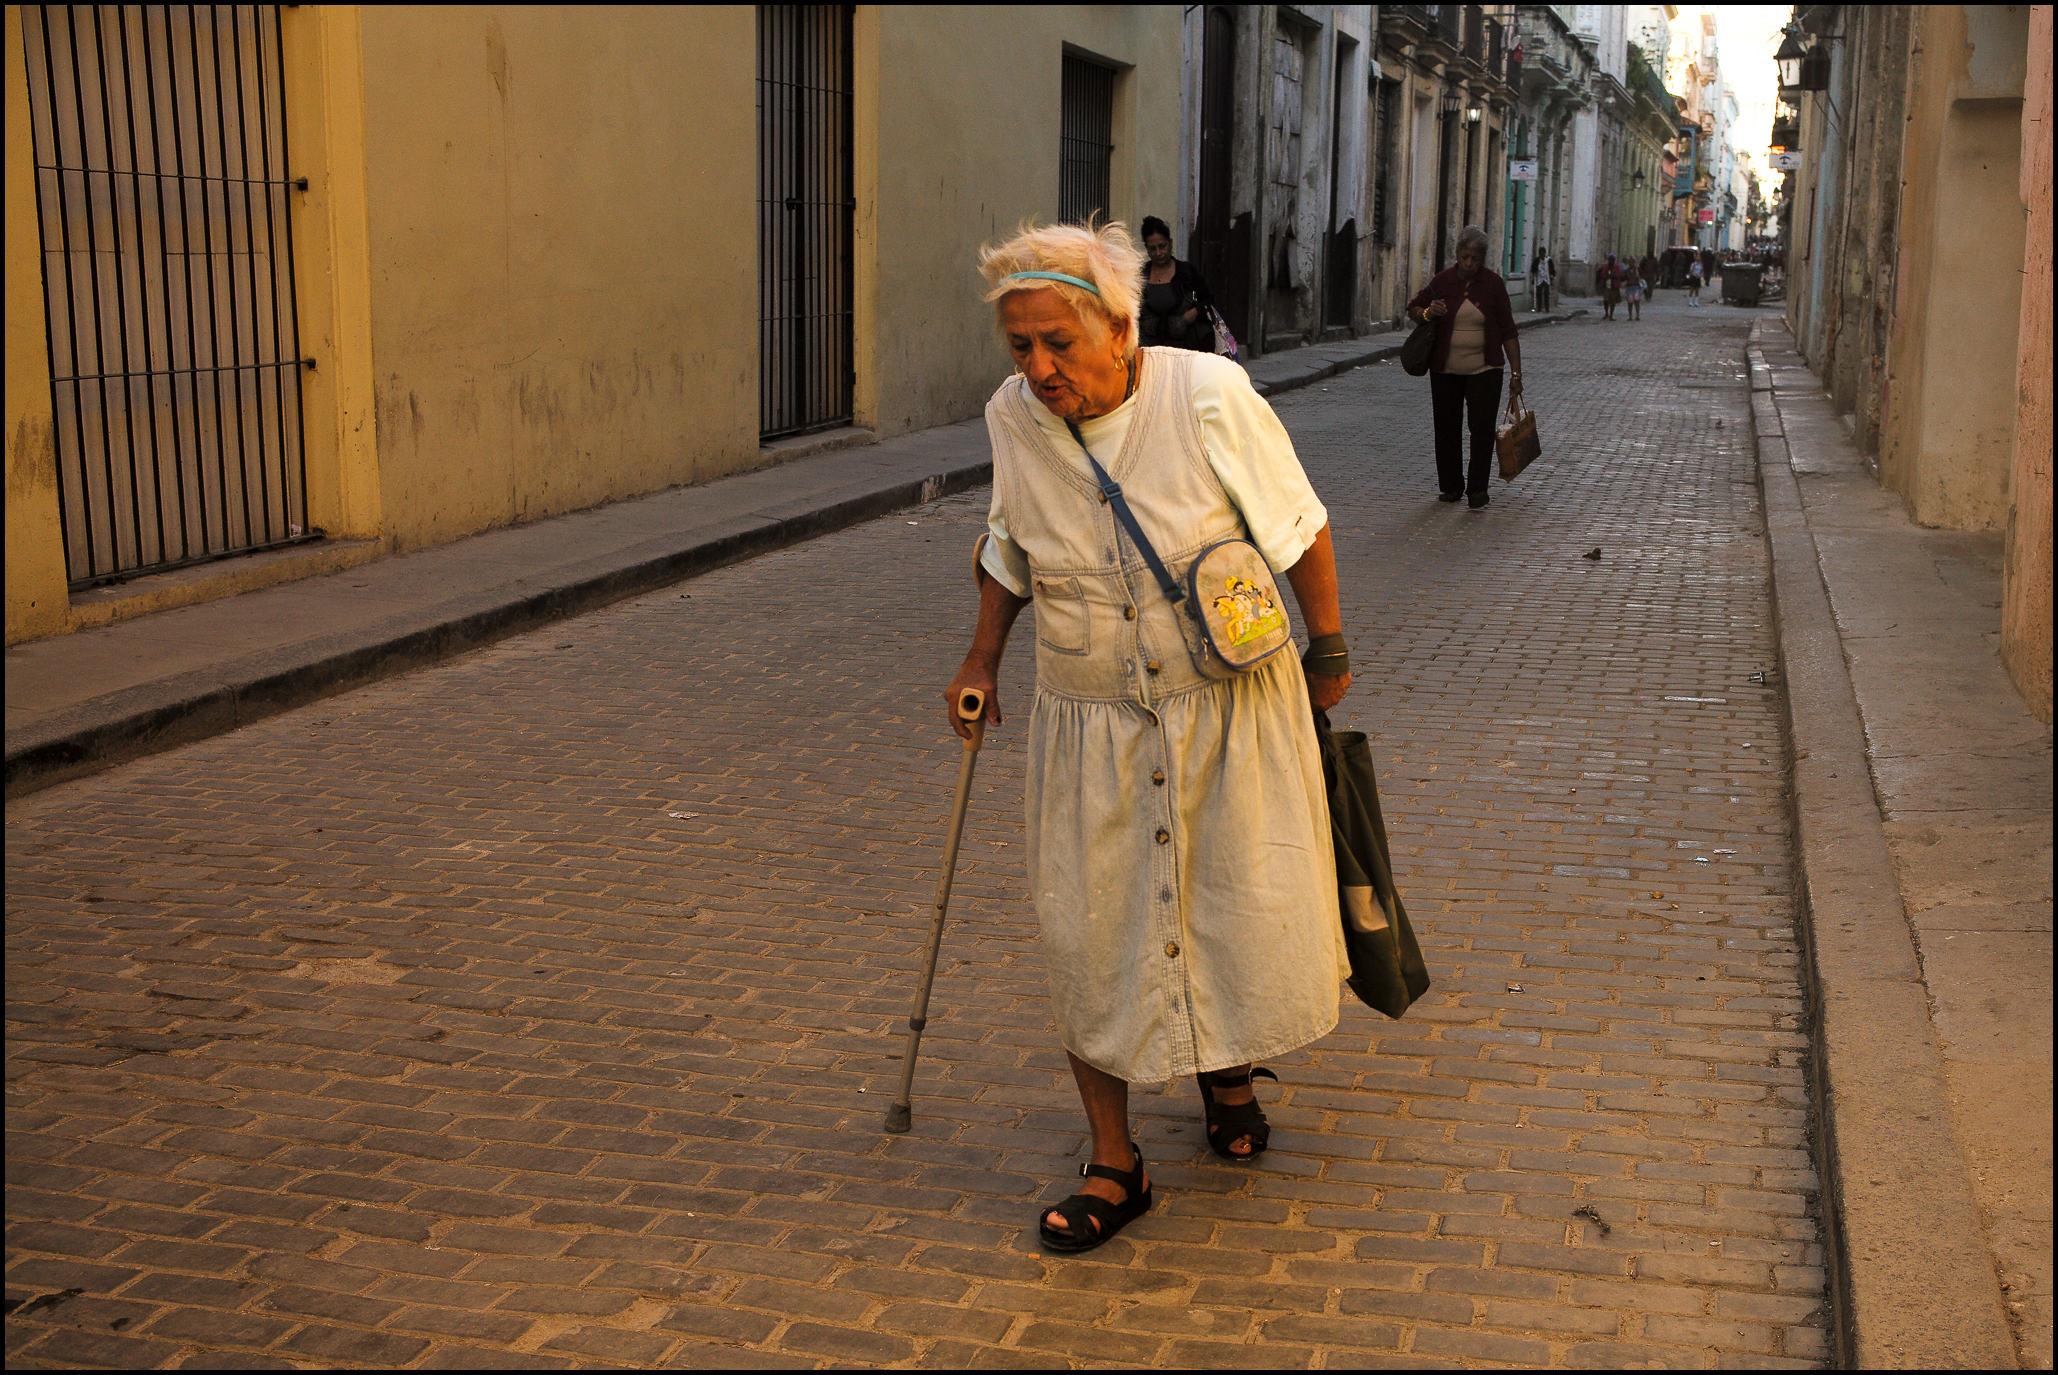 20160218 Cuba-Day 6-1007370.jpg